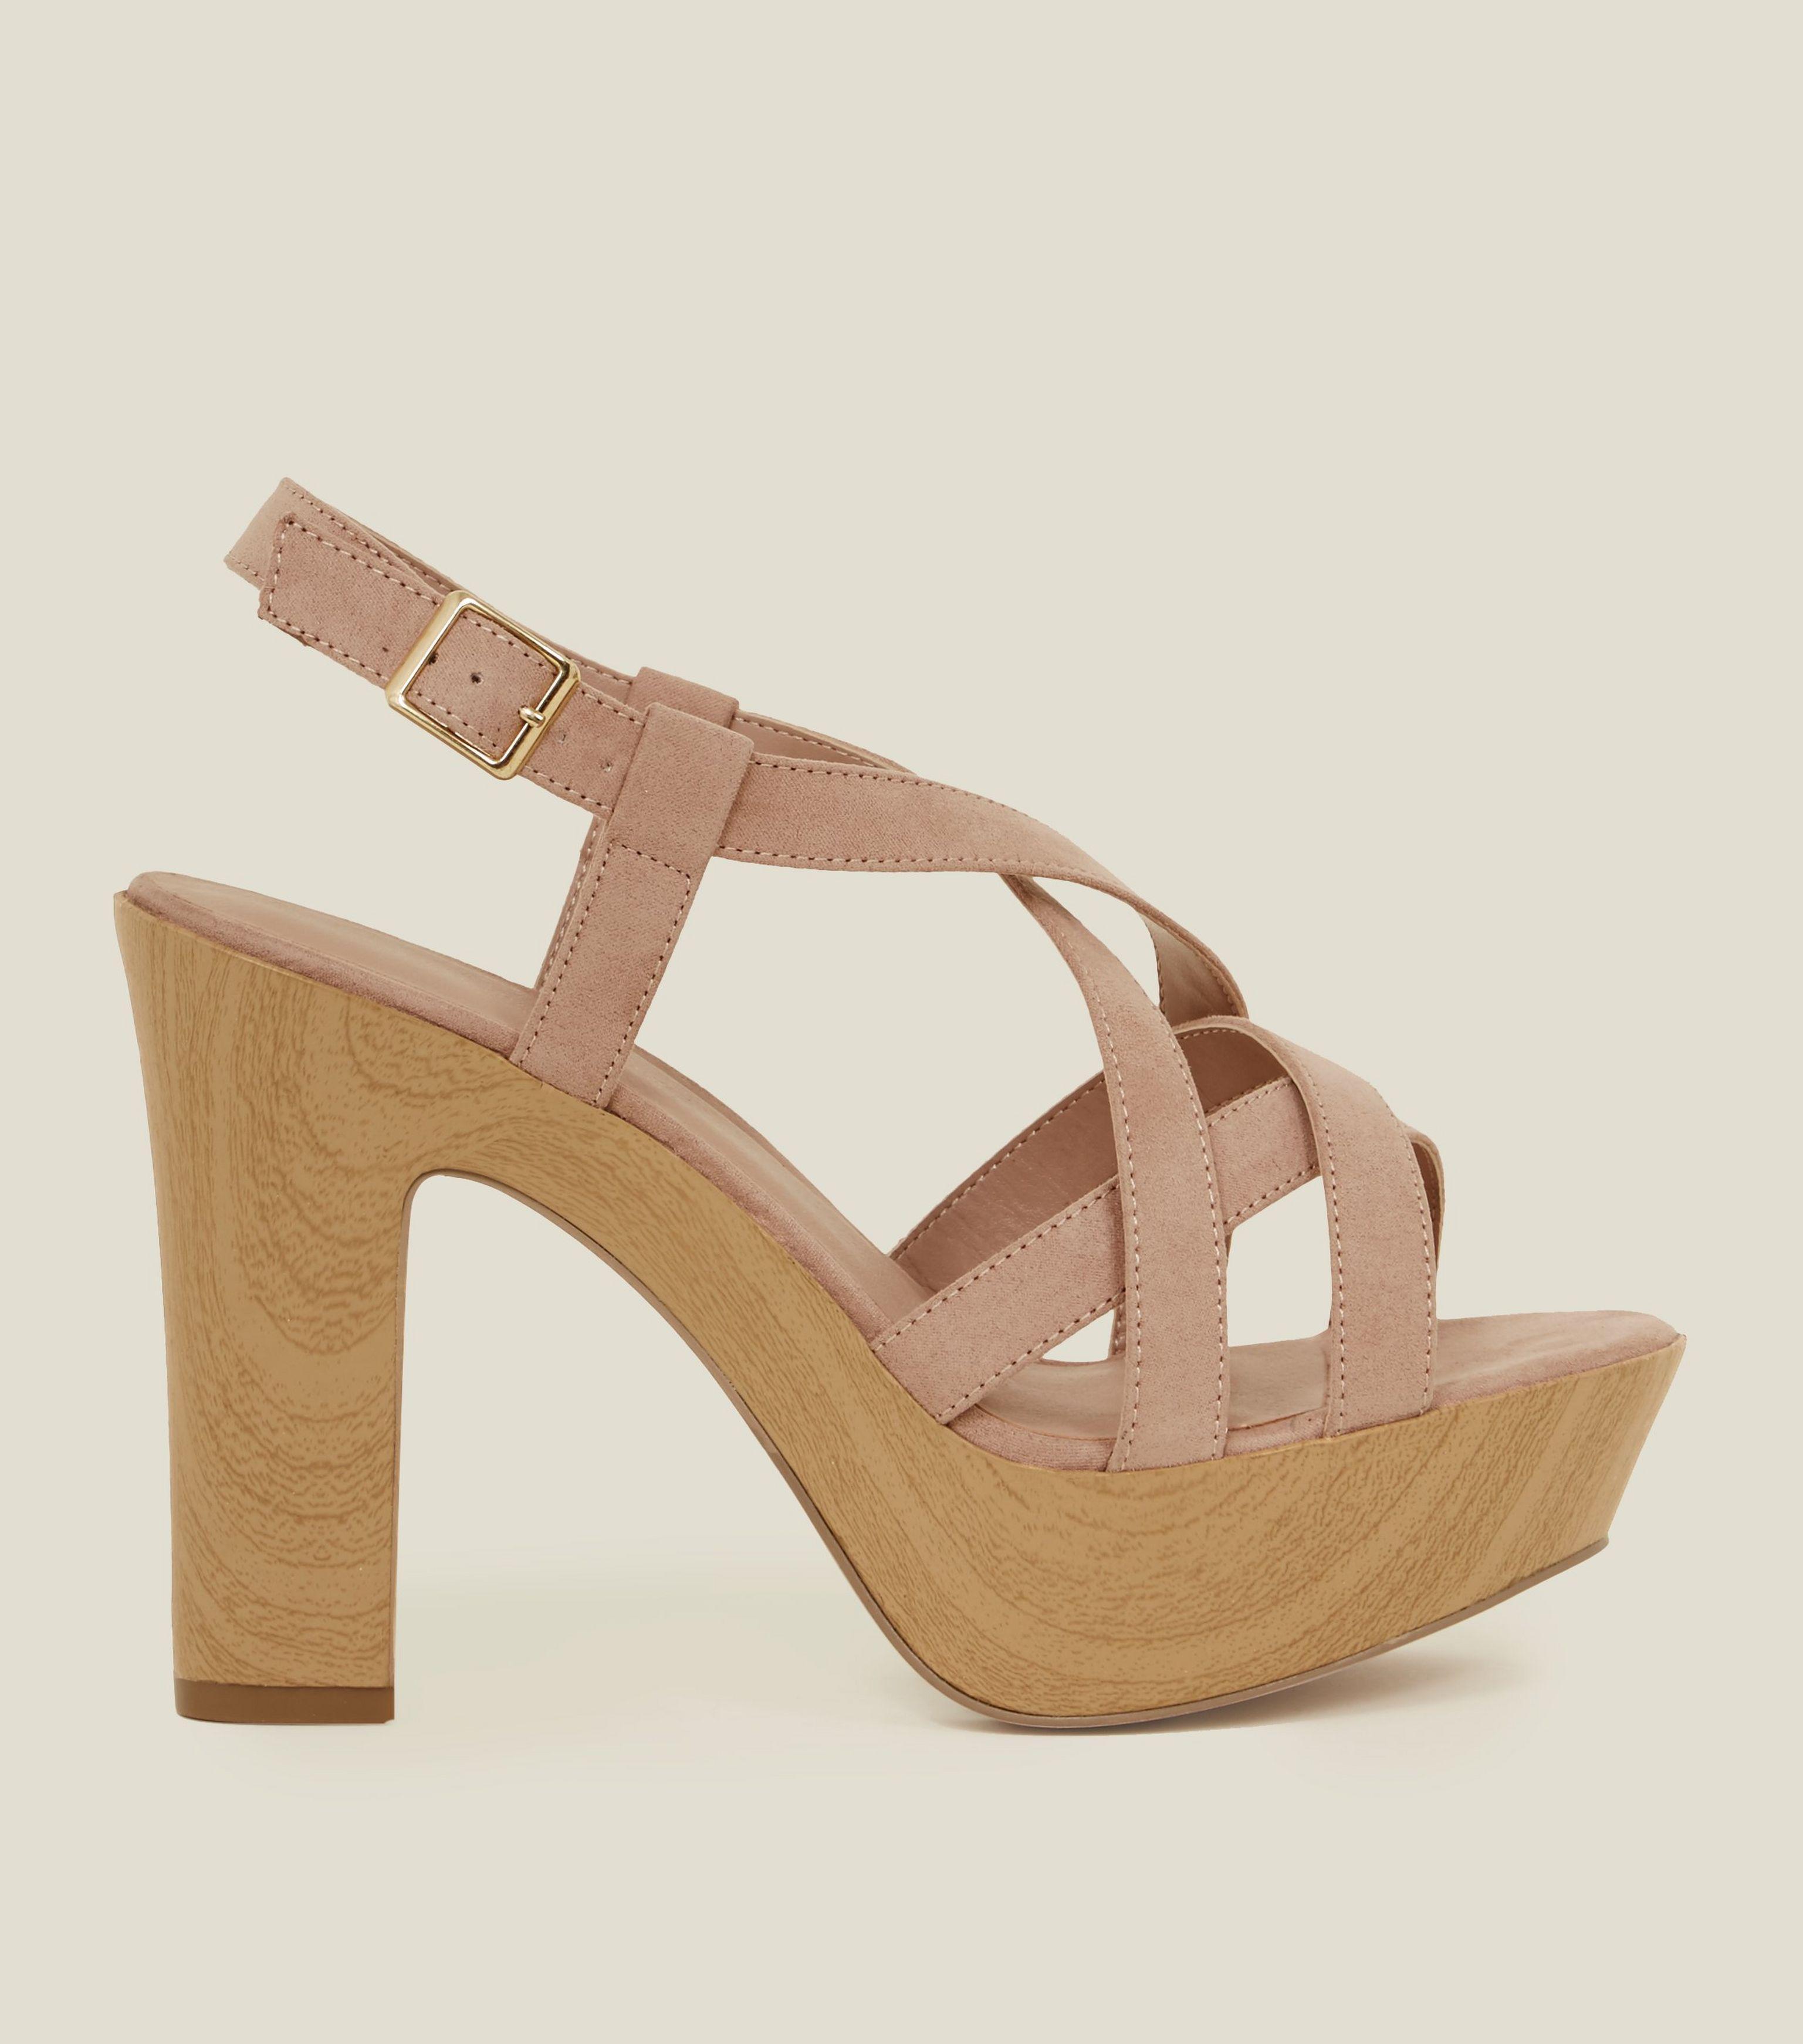 c47905ed030 New Look Wide Fit Nude Suedette Wood Platform Block Heels in Natural ...